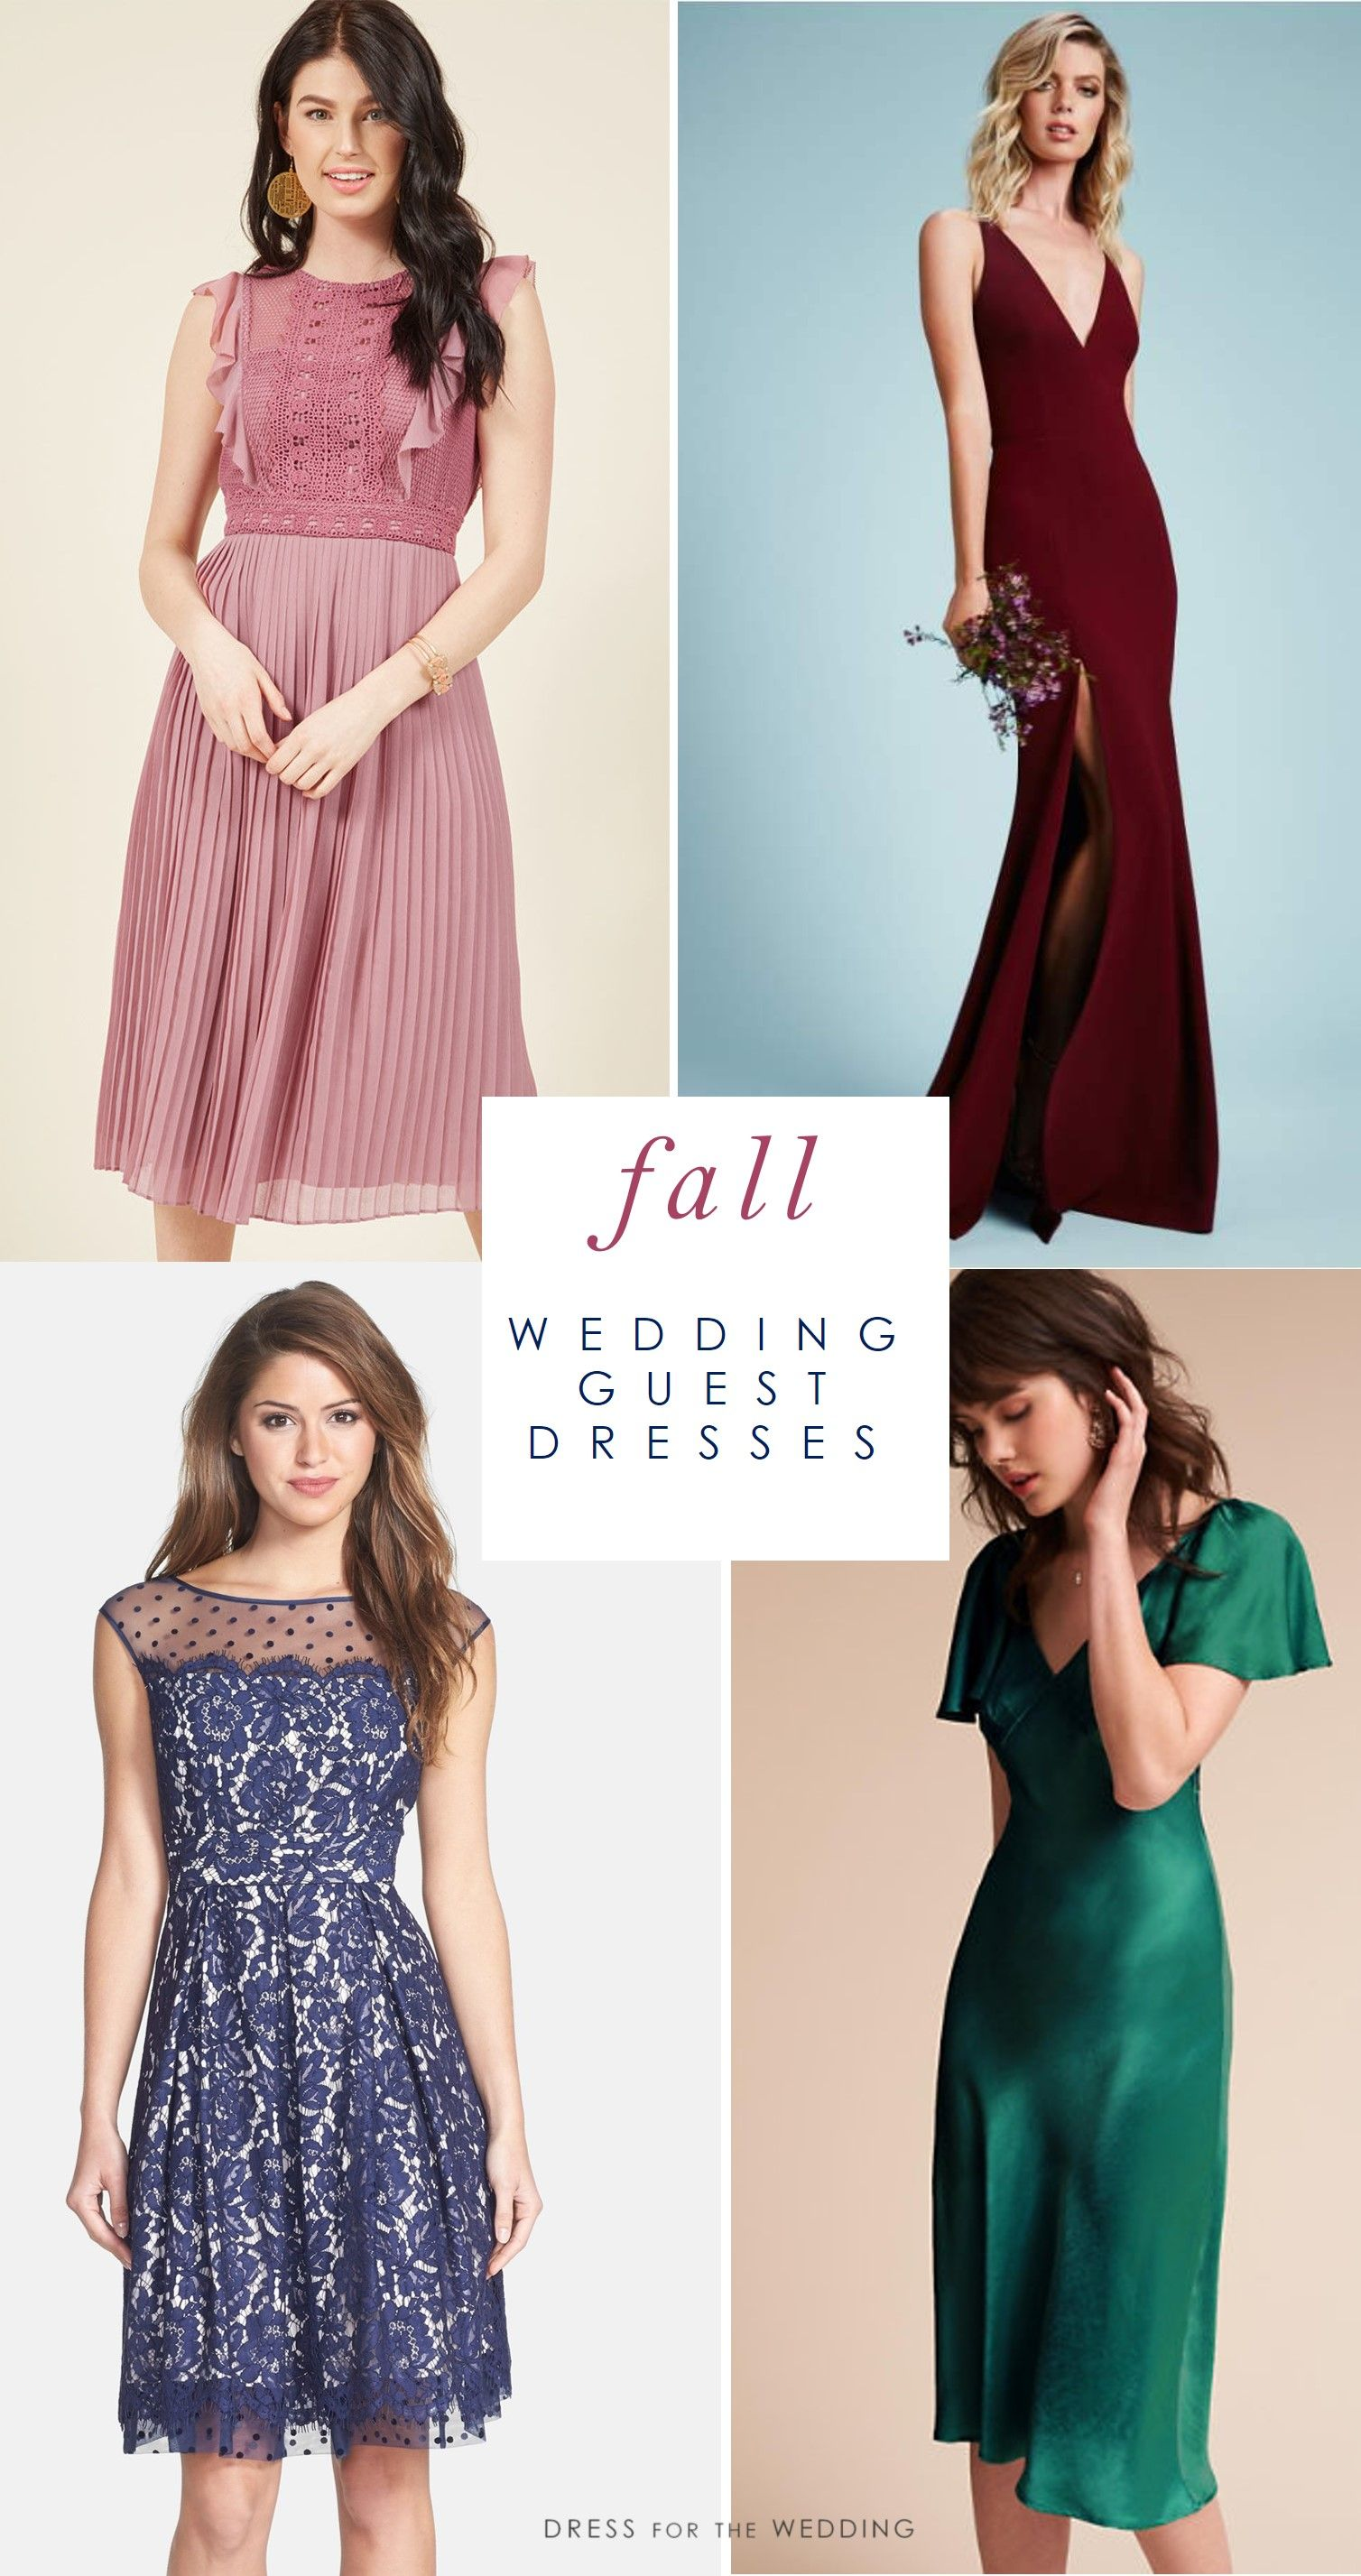 What To Wear To A Fall Wedding Somewhere Lately Wedding Attire Guest October Wedding Guest Dress Beach Wedding Guest Dress [ 1907 x 860 Pixel ]